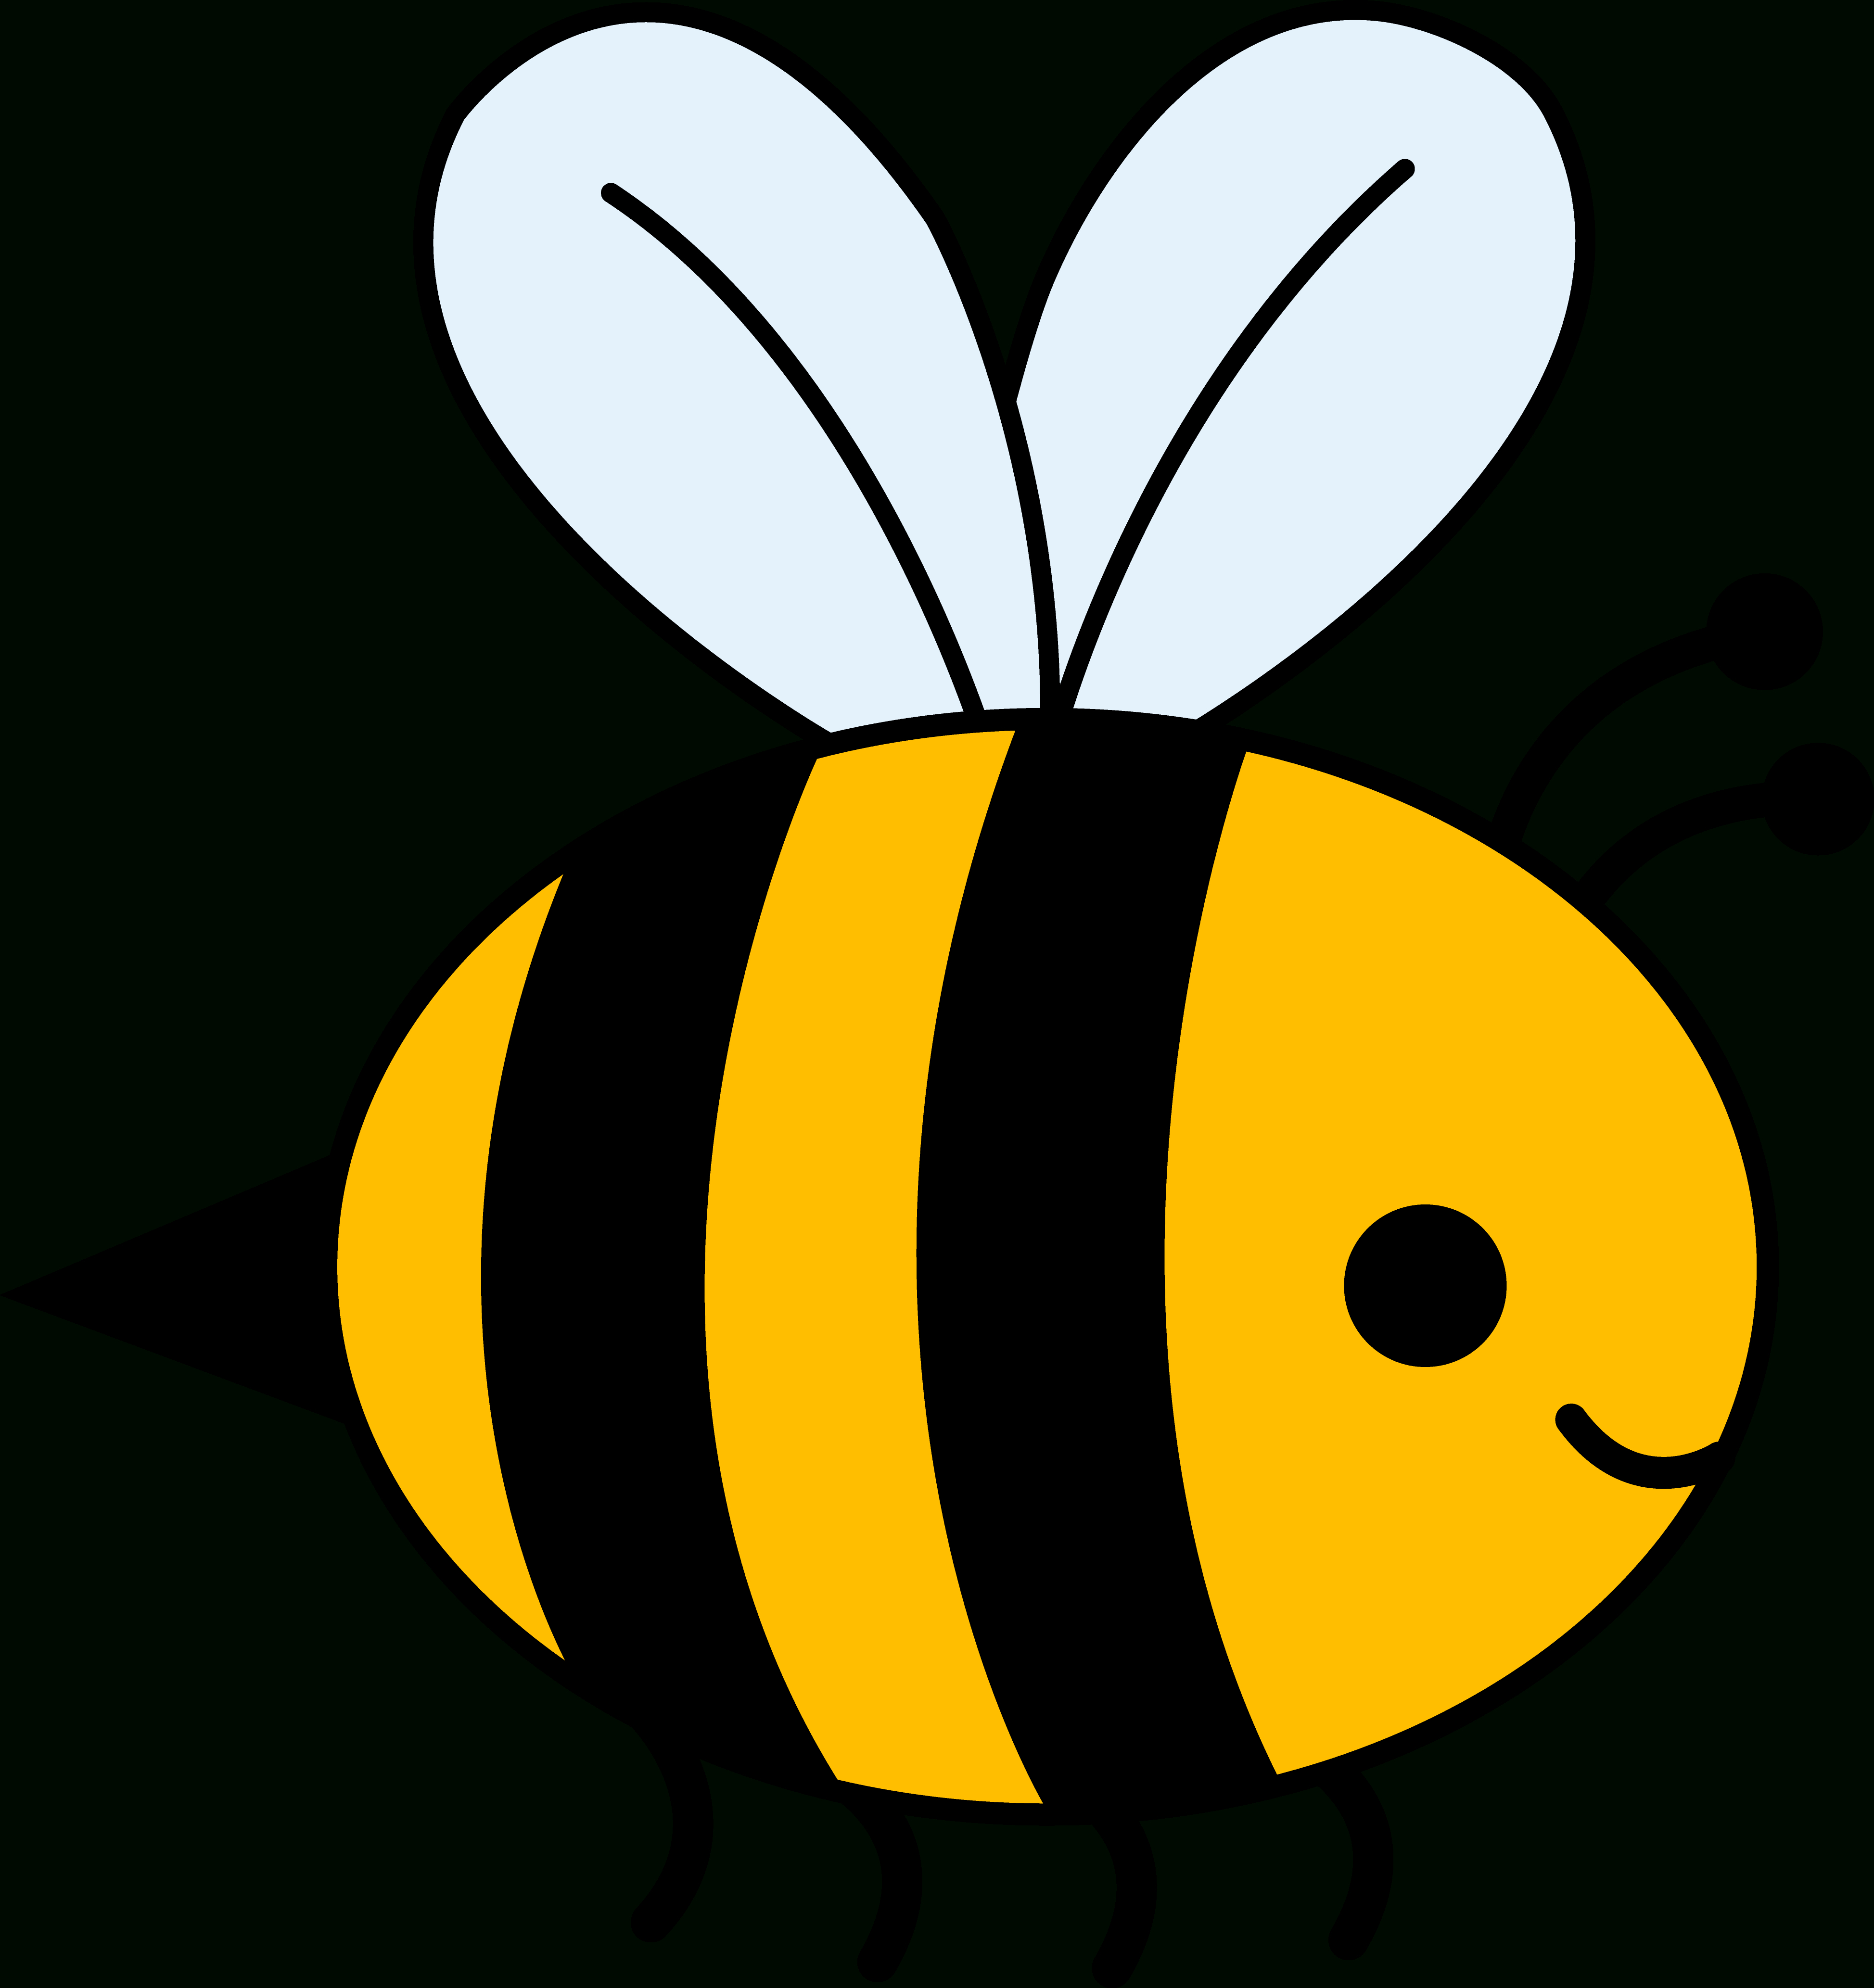 Bumblebee clipart easy. Bumble bee drawing cartoon